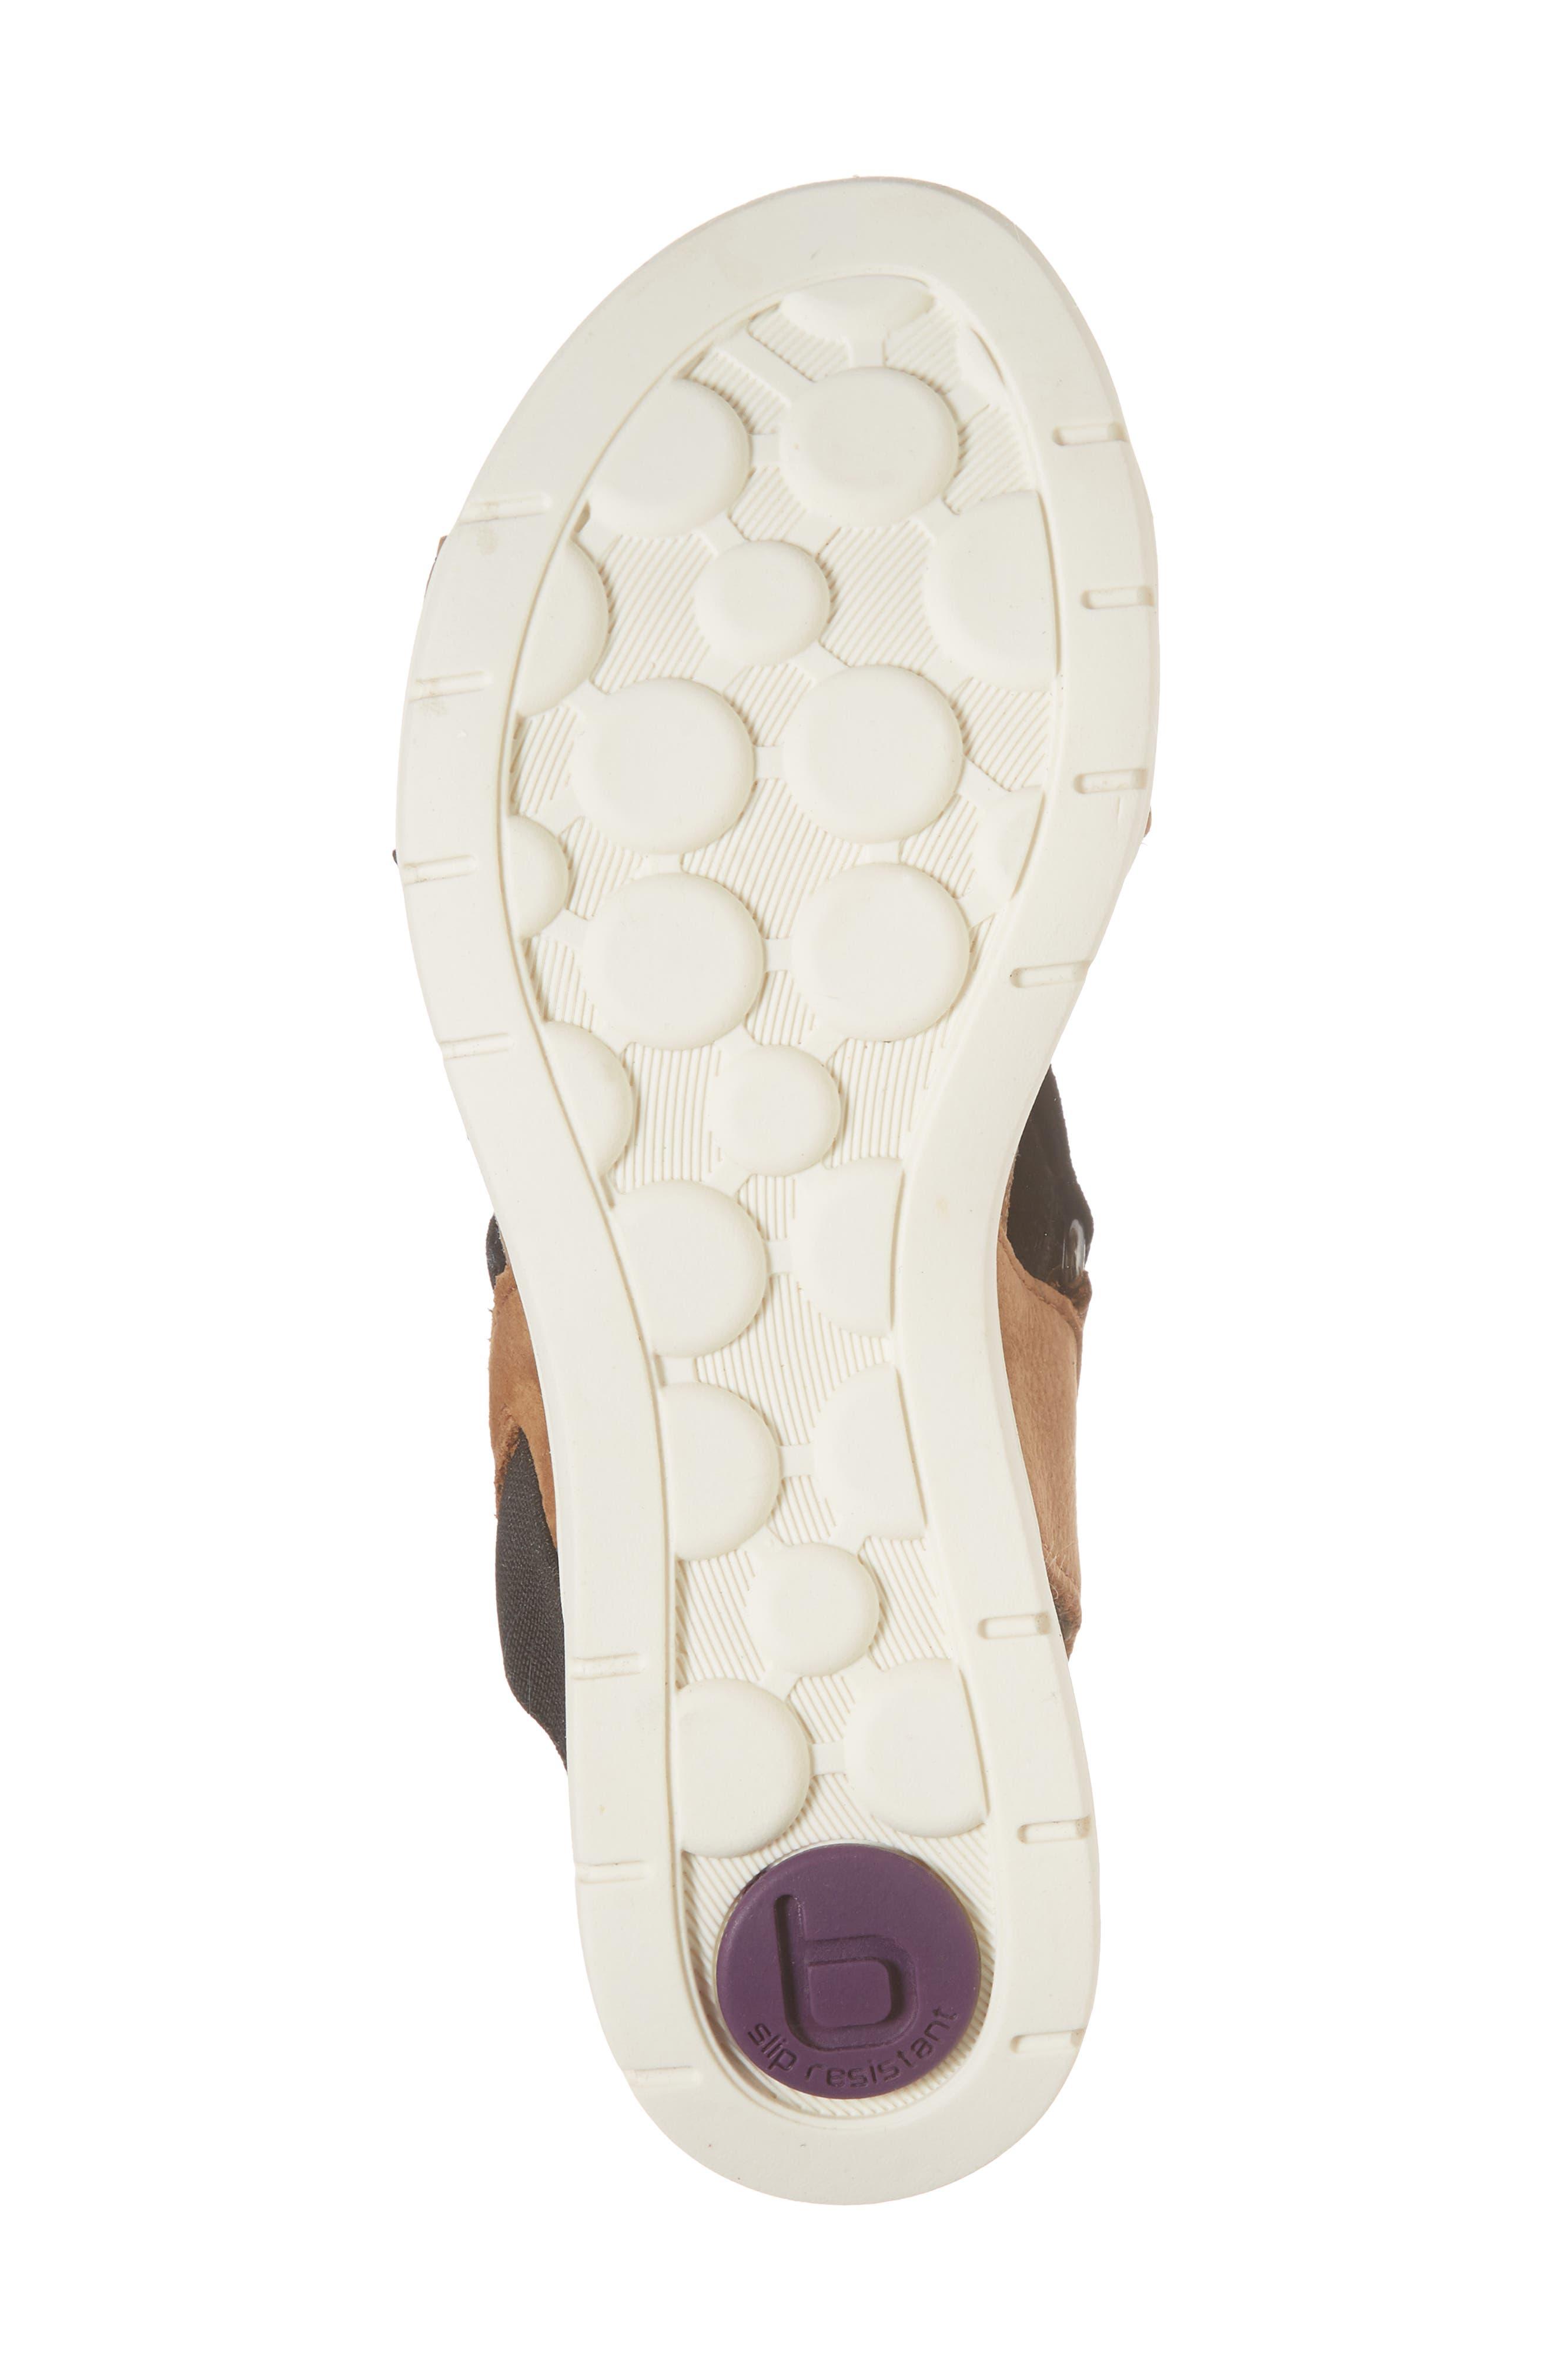 Paisley Wedge Sandal,                             Alternate thumbnail 22, color,